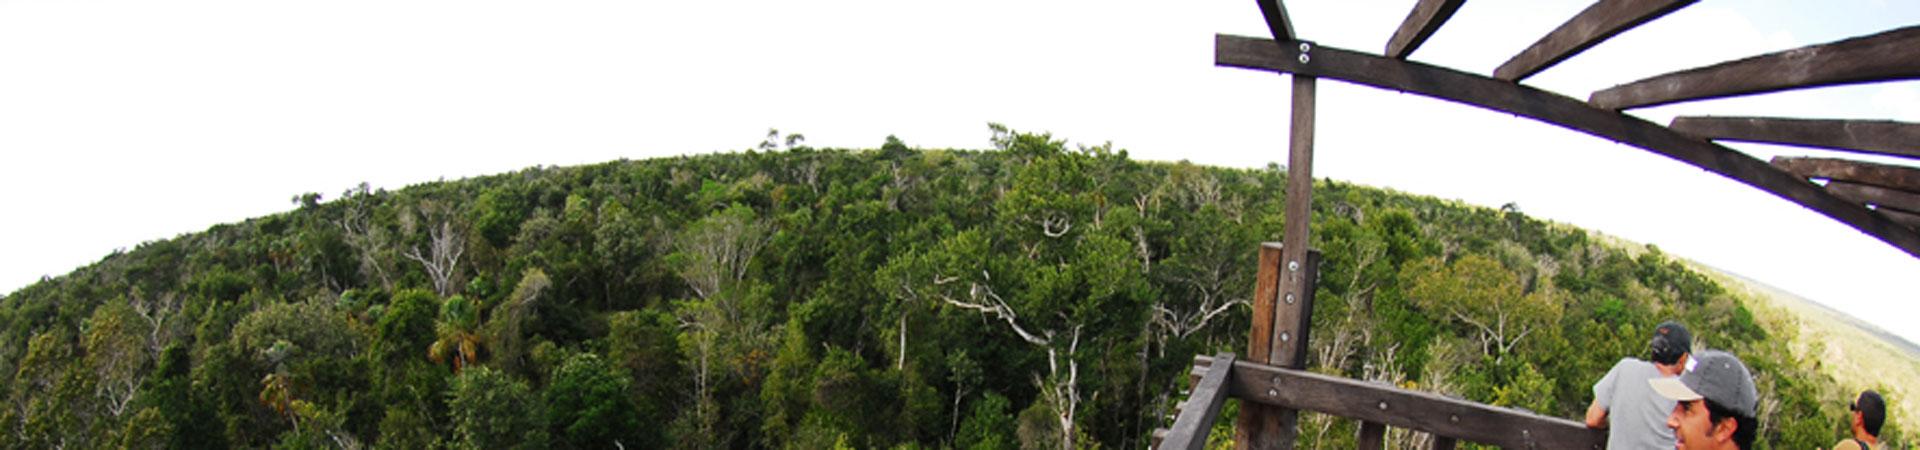 panoramica desde la torre de Noh Bec